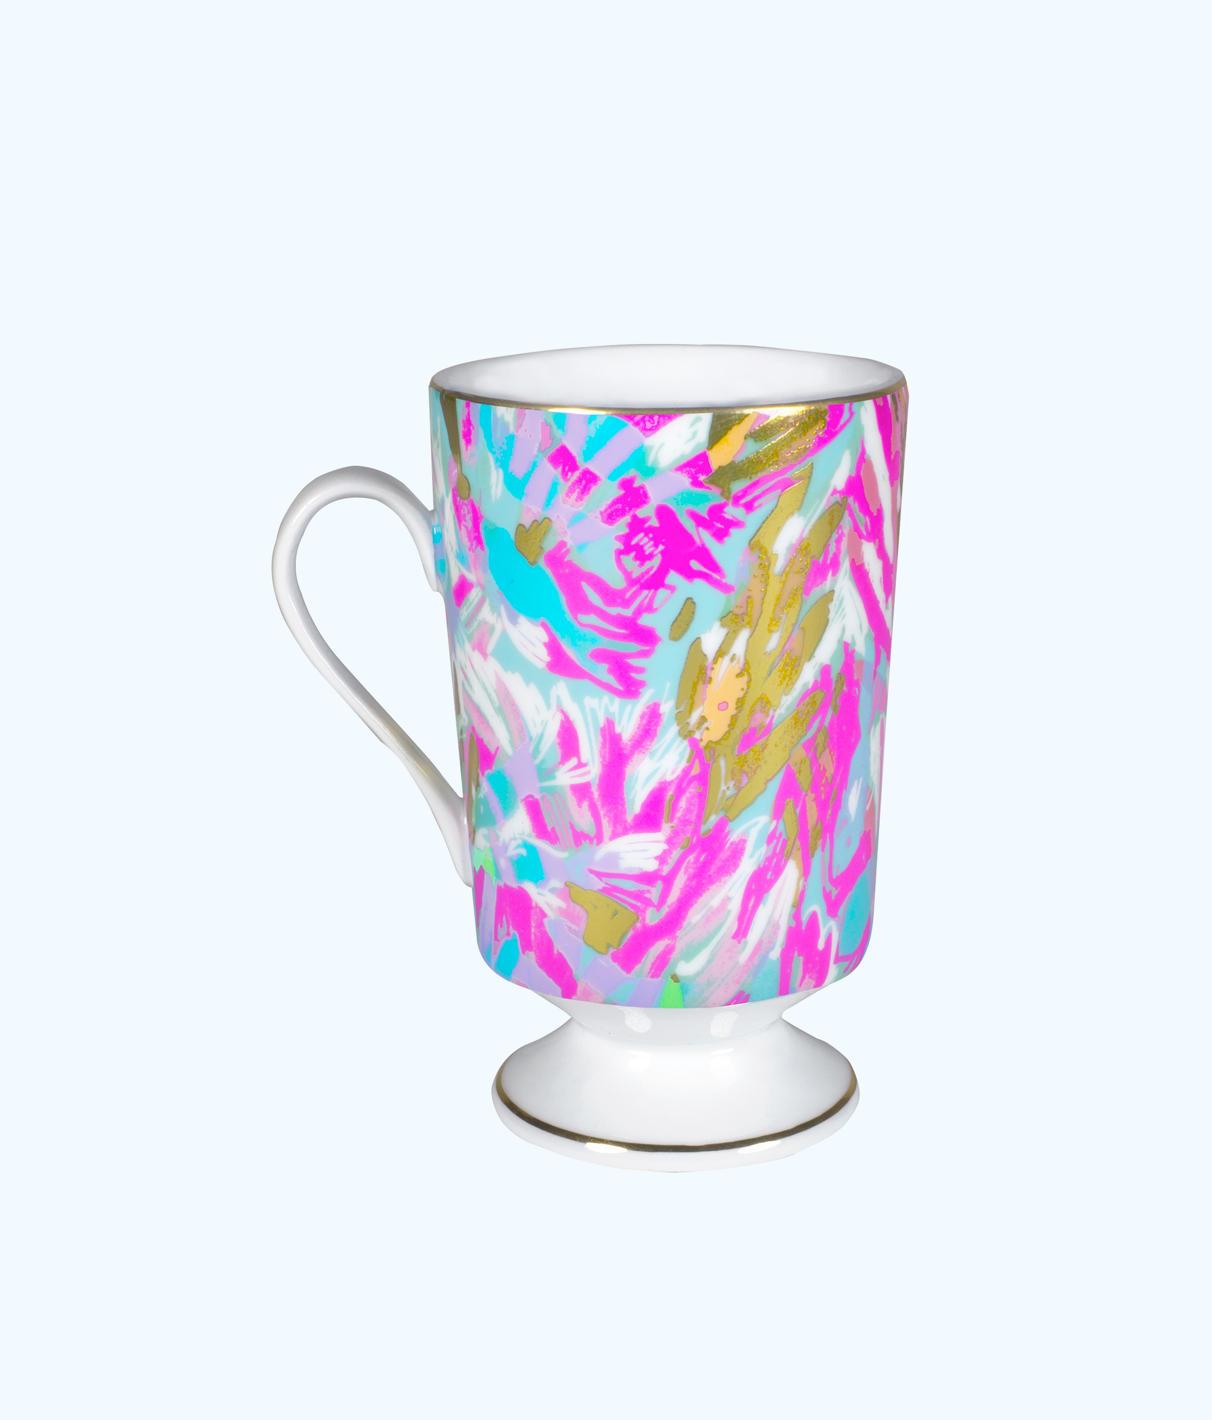 Lilly Pulitzer Lilly Pulitzer Ceramic Mug